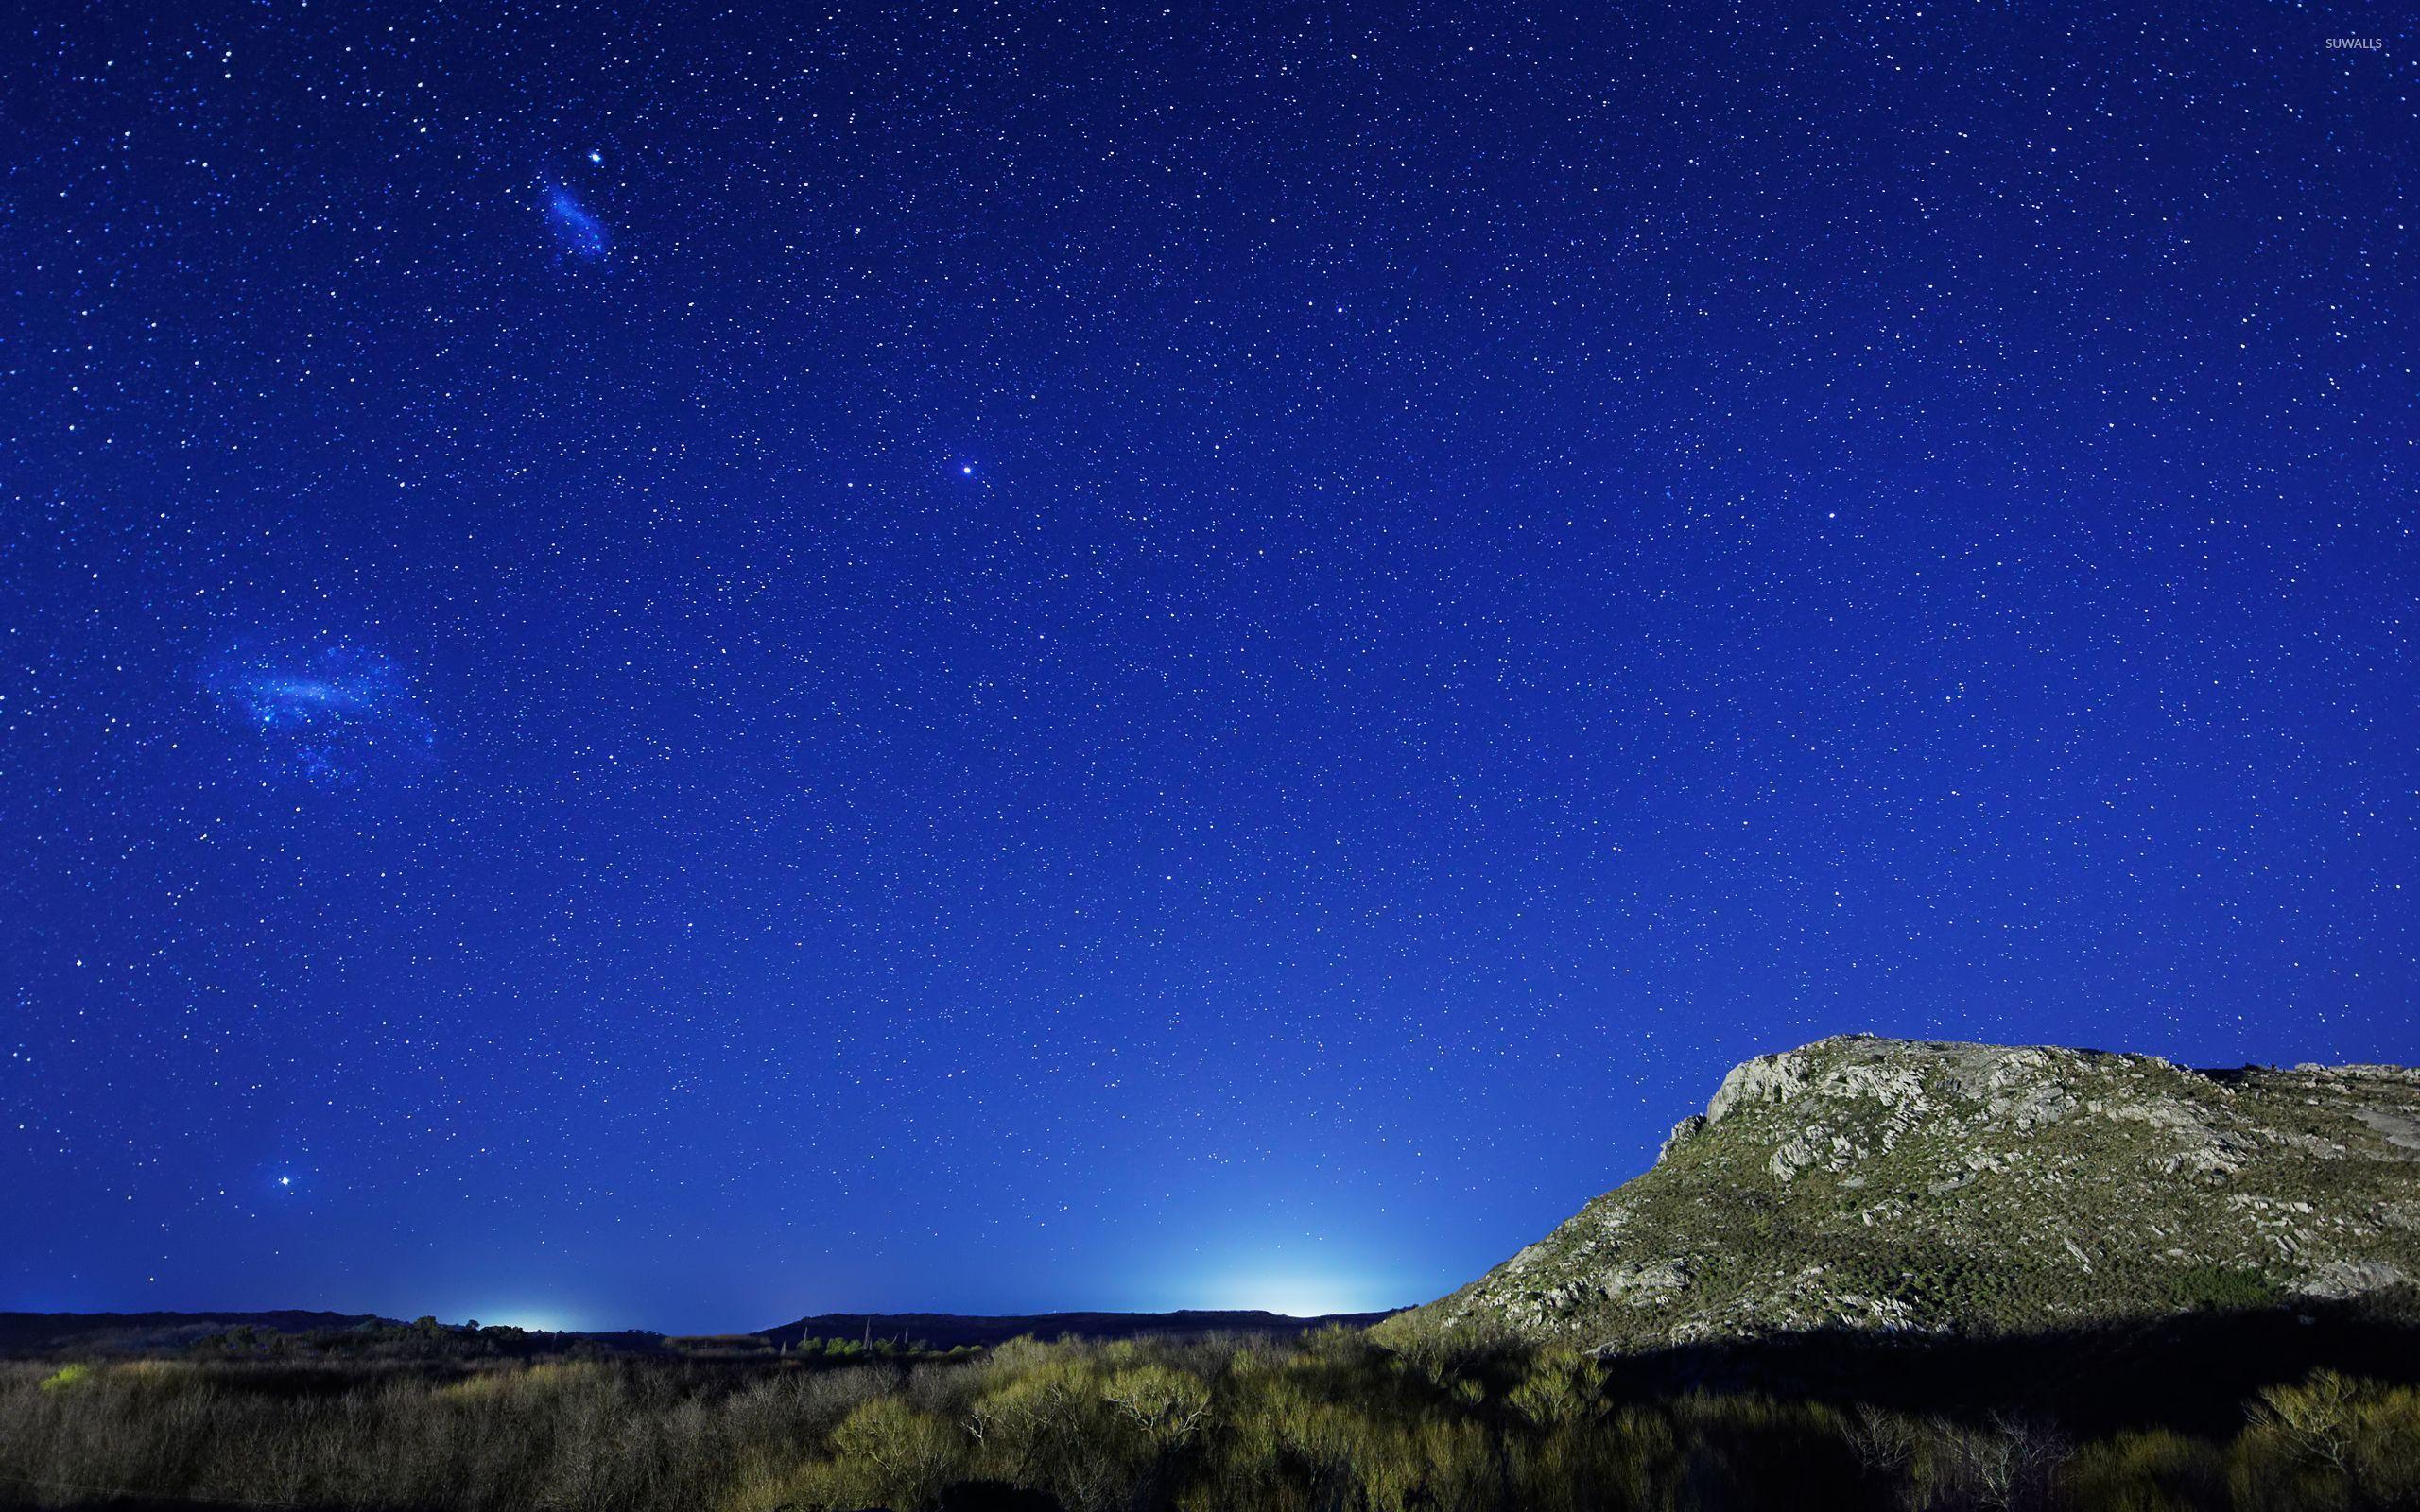 Starry Night Sky HD desktop wallpaper High Definition